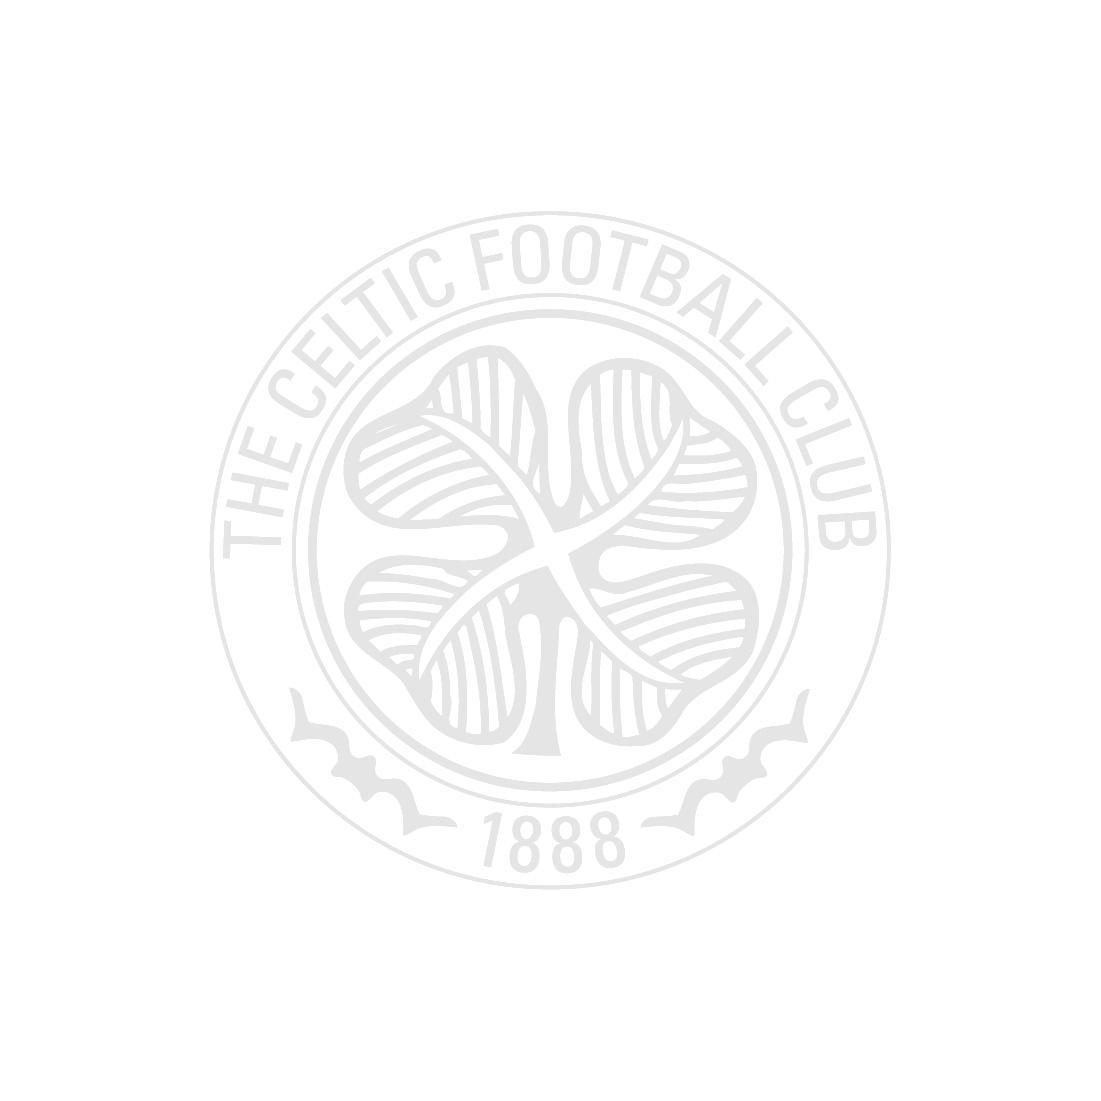 Celtic FC Forrest Autograph Mug